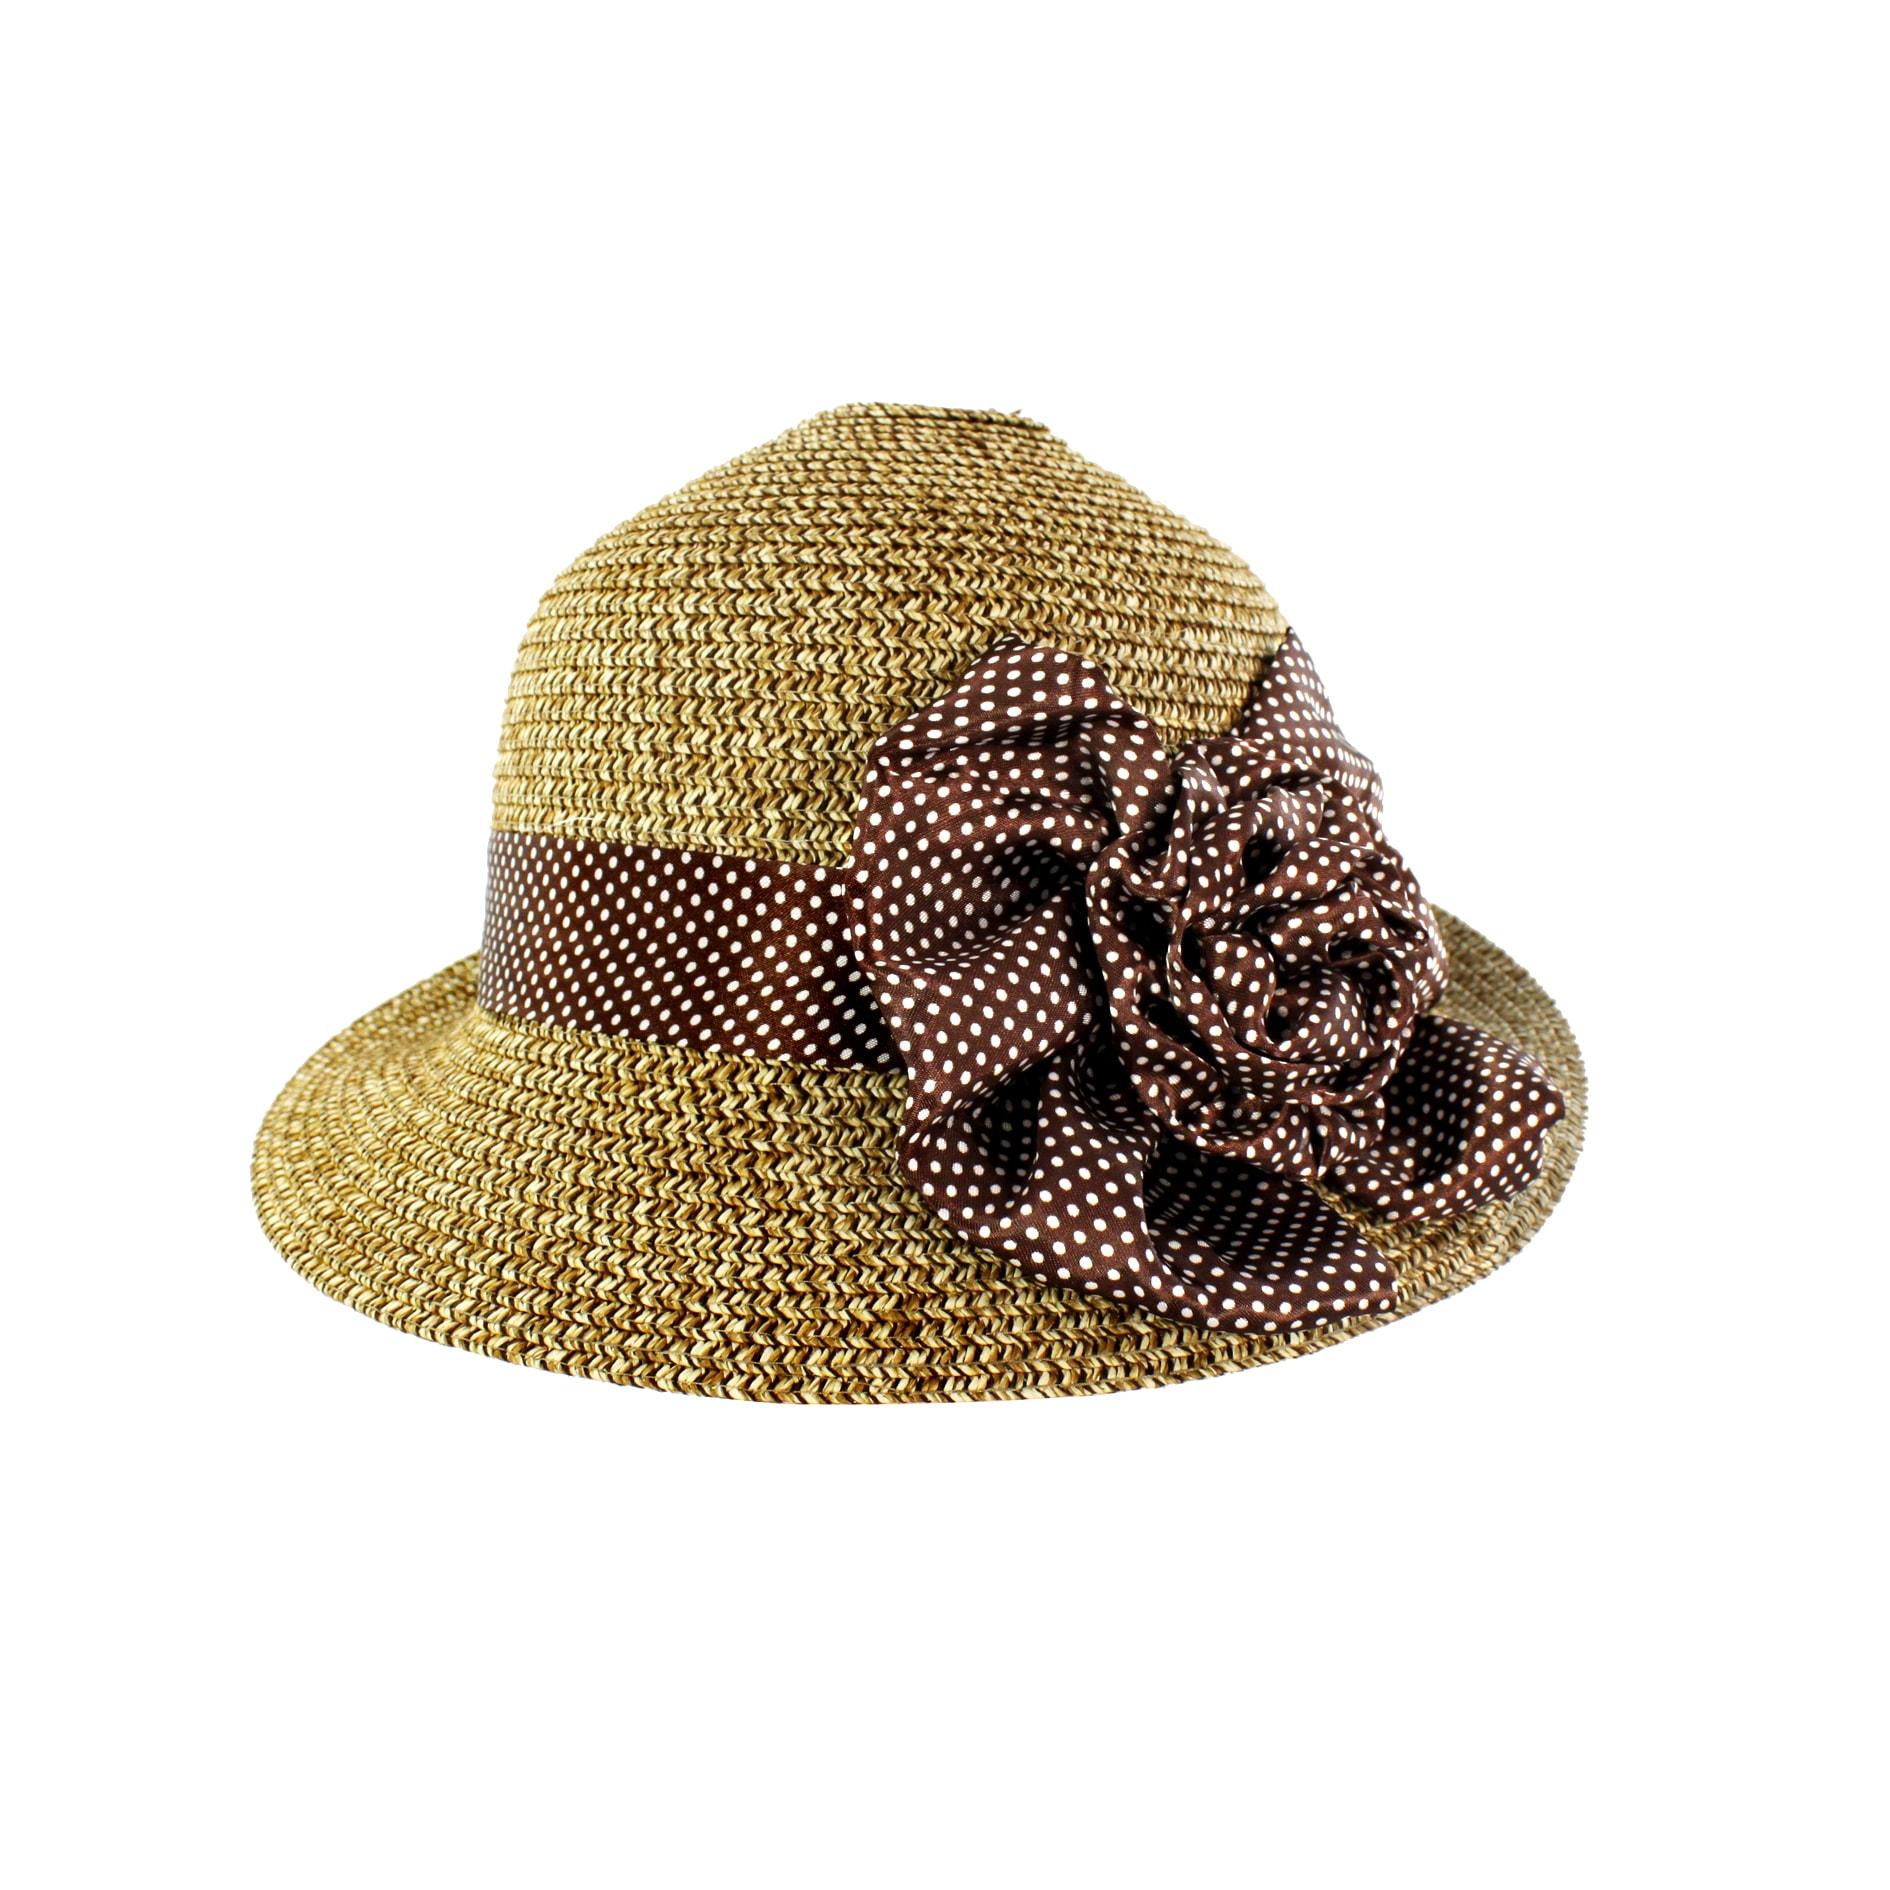 Faddism Women's Tan Straw Rosette Sun Hat